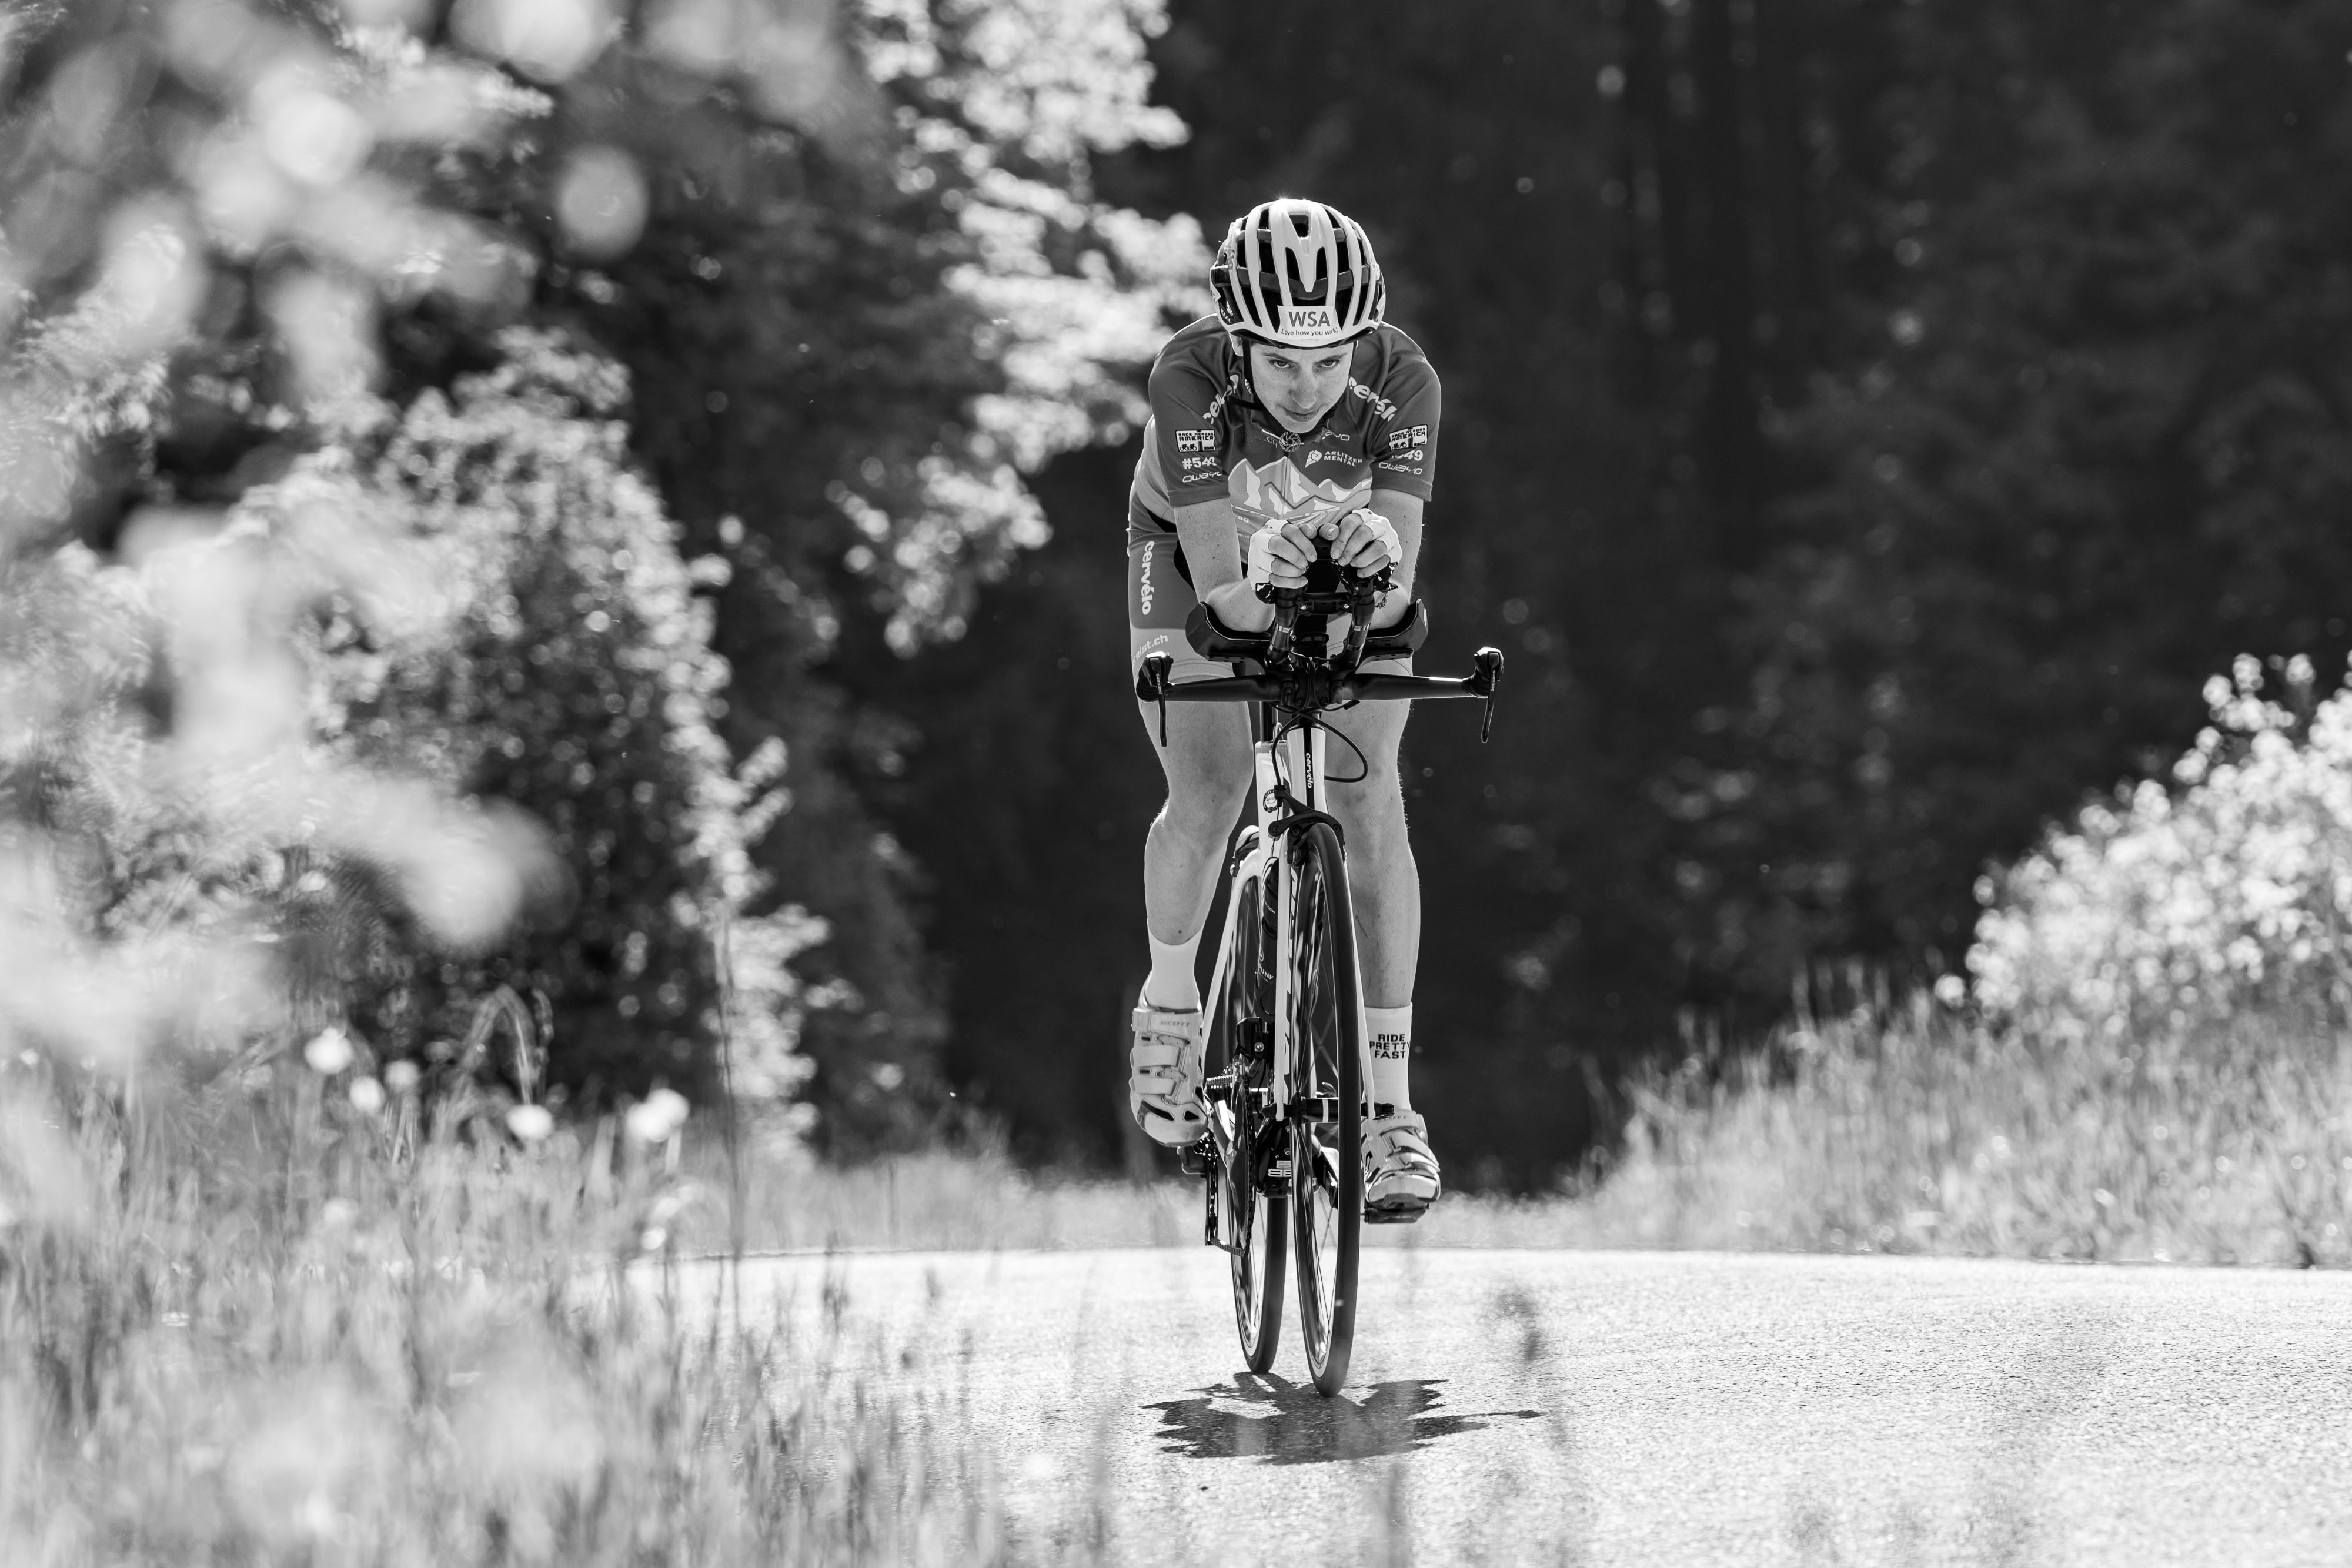 NicoleReist_Ultracycling_Saison2019_Bildnr-21-2_cUrsNett_lowresjpg